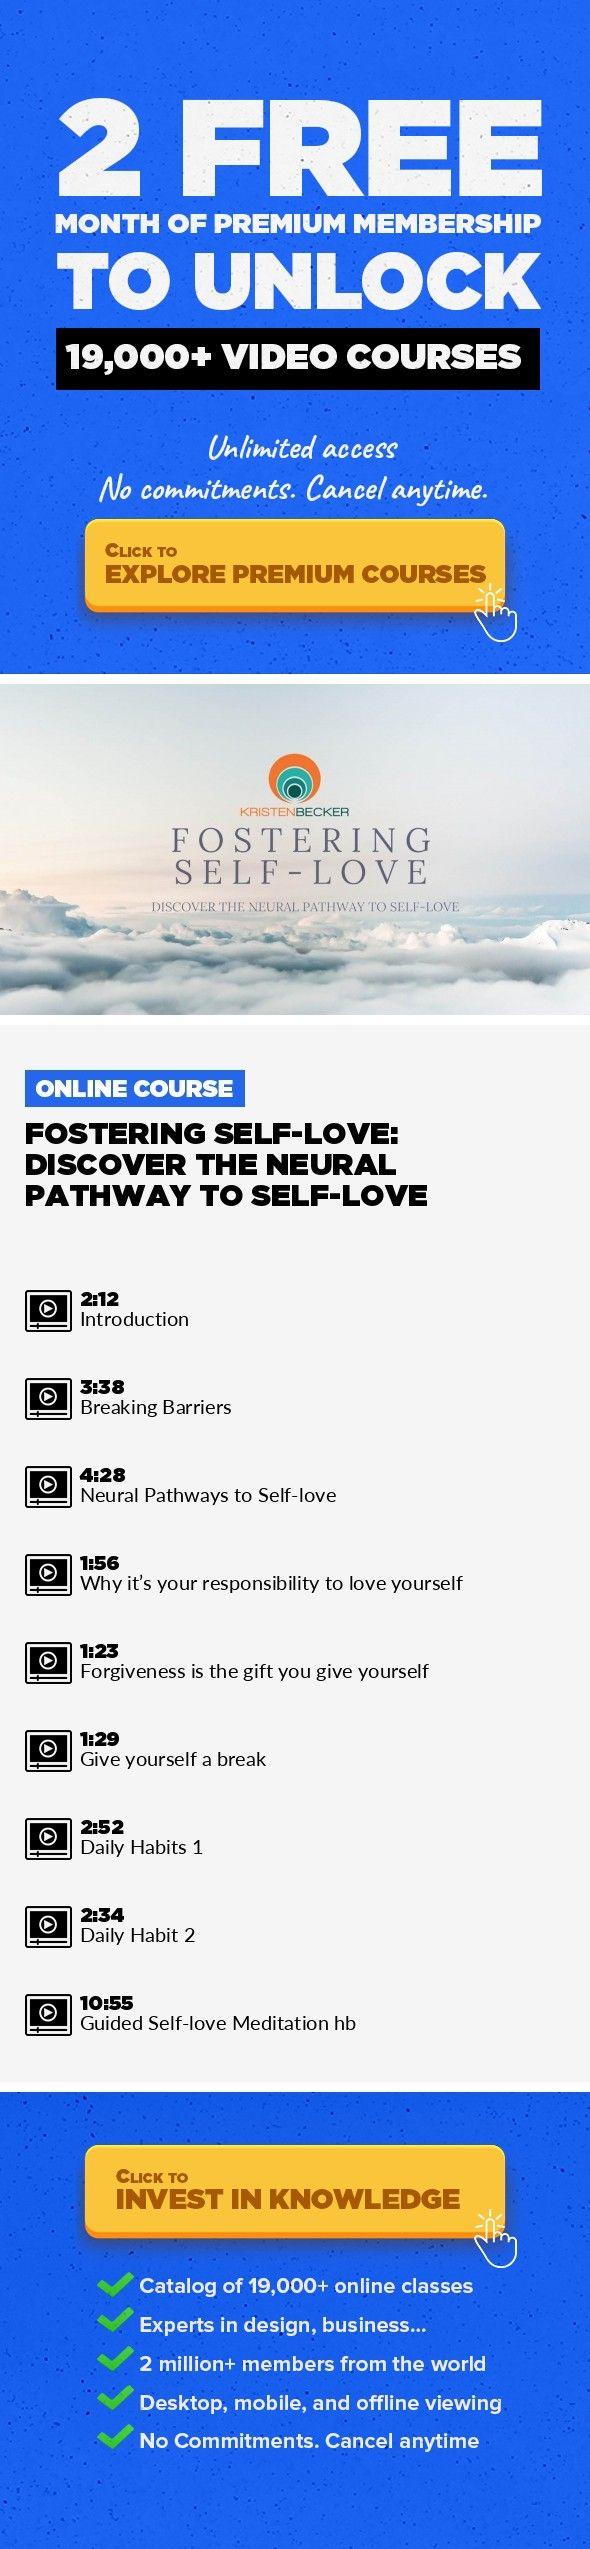 Fostering Self-love: Discover the Neural Pathway to Self-love Health &  Wellness, Lifestyle, Self Improvement, Love, Self-love, Self Esteeem,  Belief Models ...